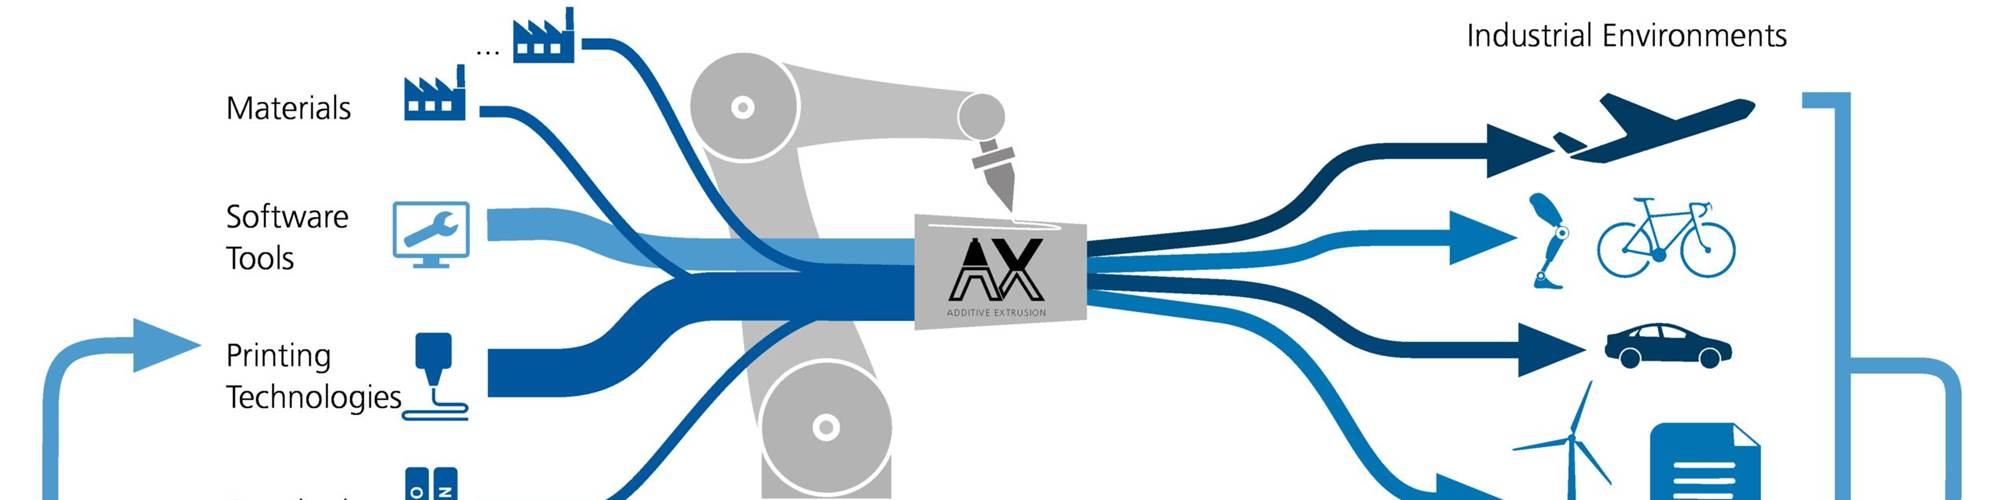 DLR灌顶ax添加剂挤出创新实验室